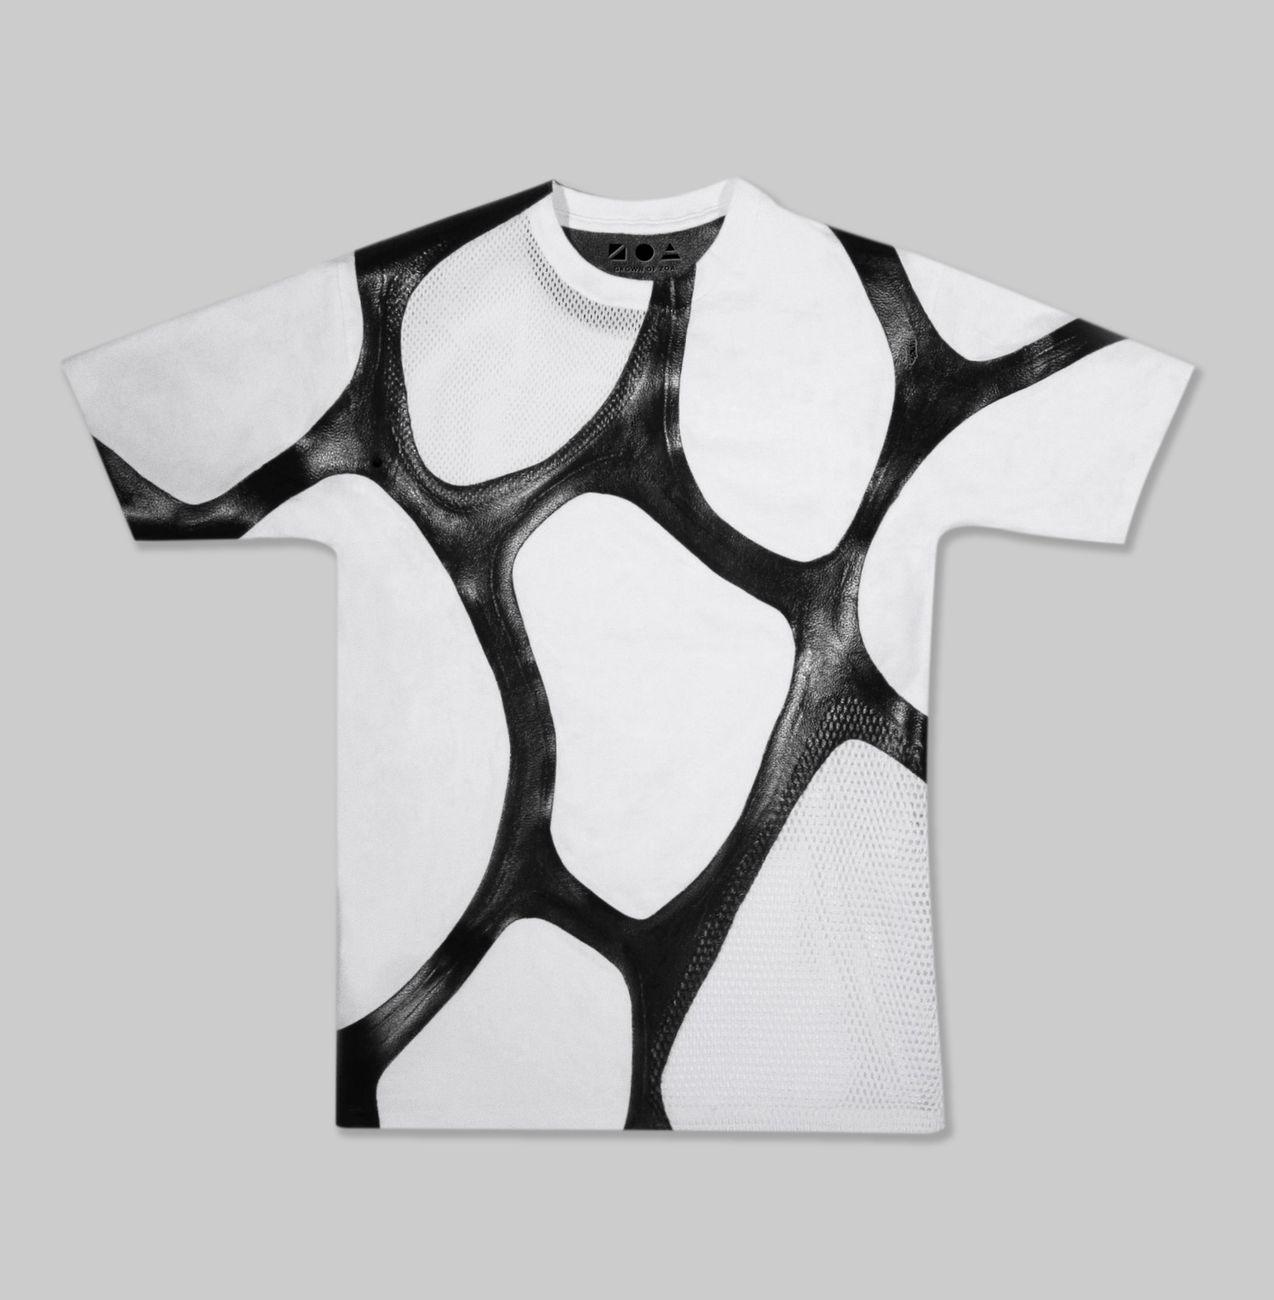 Next Design Perspectives. Zoa Biofabricated Bioeather T-shirt MoMA. Photo credit Sara Kinney